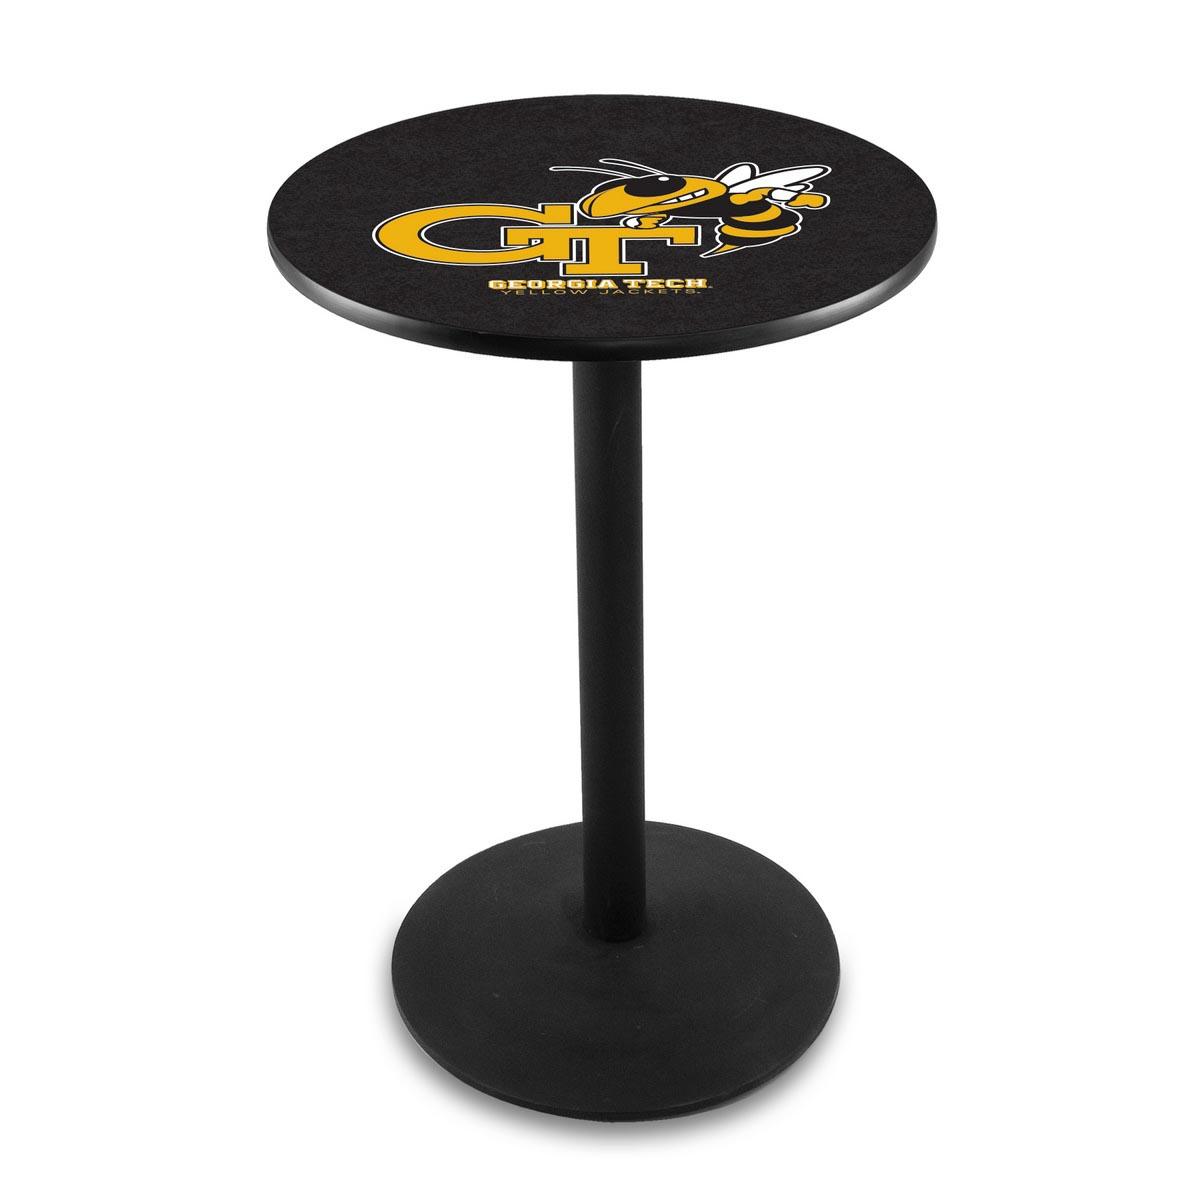 Optimal Georgia Tech Logo Pub Bar Table Round Stand Product Photo